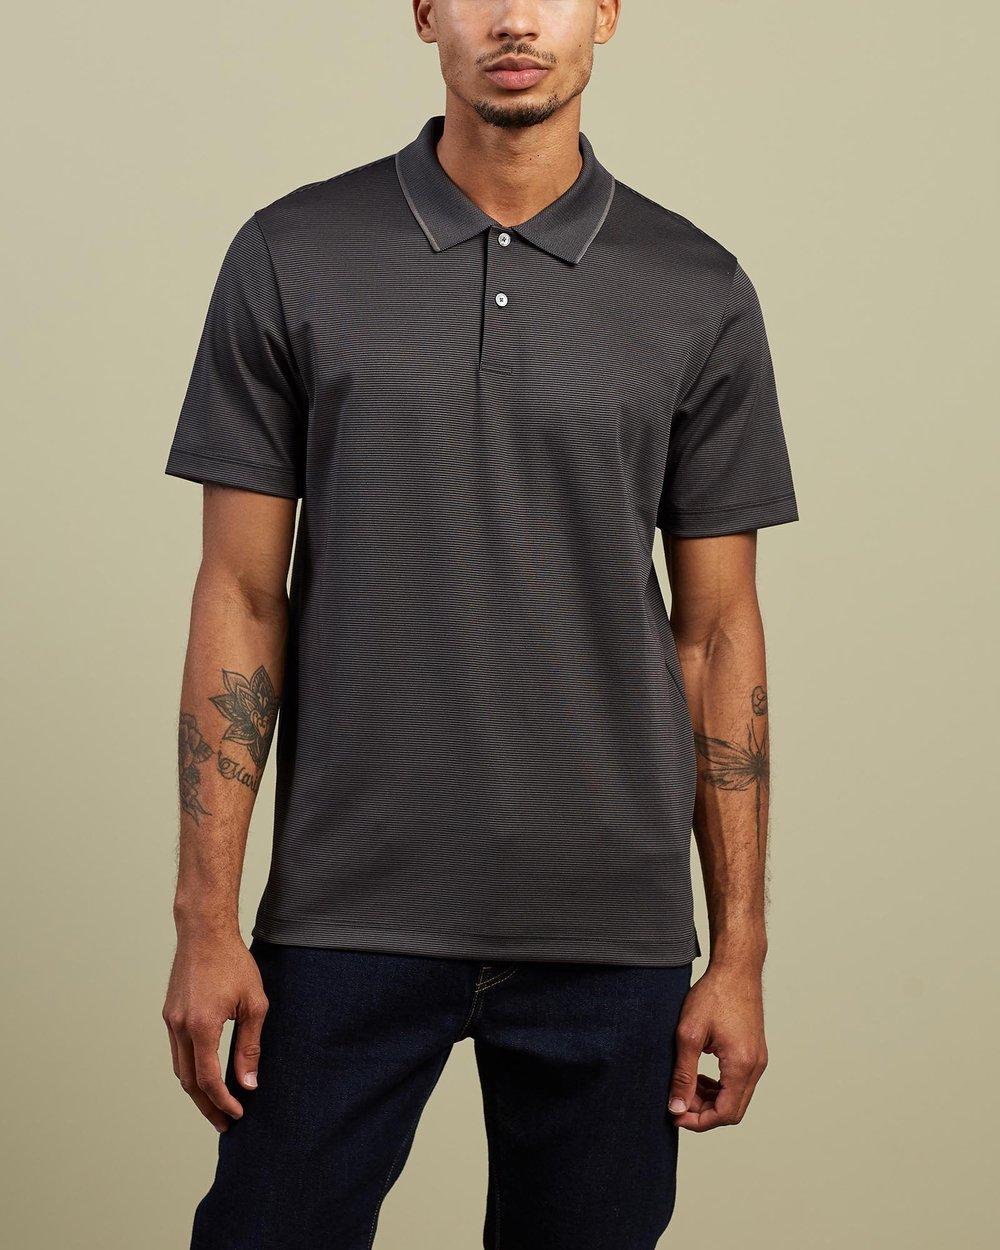 Theory Mens Polo Casual Shirt Short Sleeve XS S Blue Black NEW $89